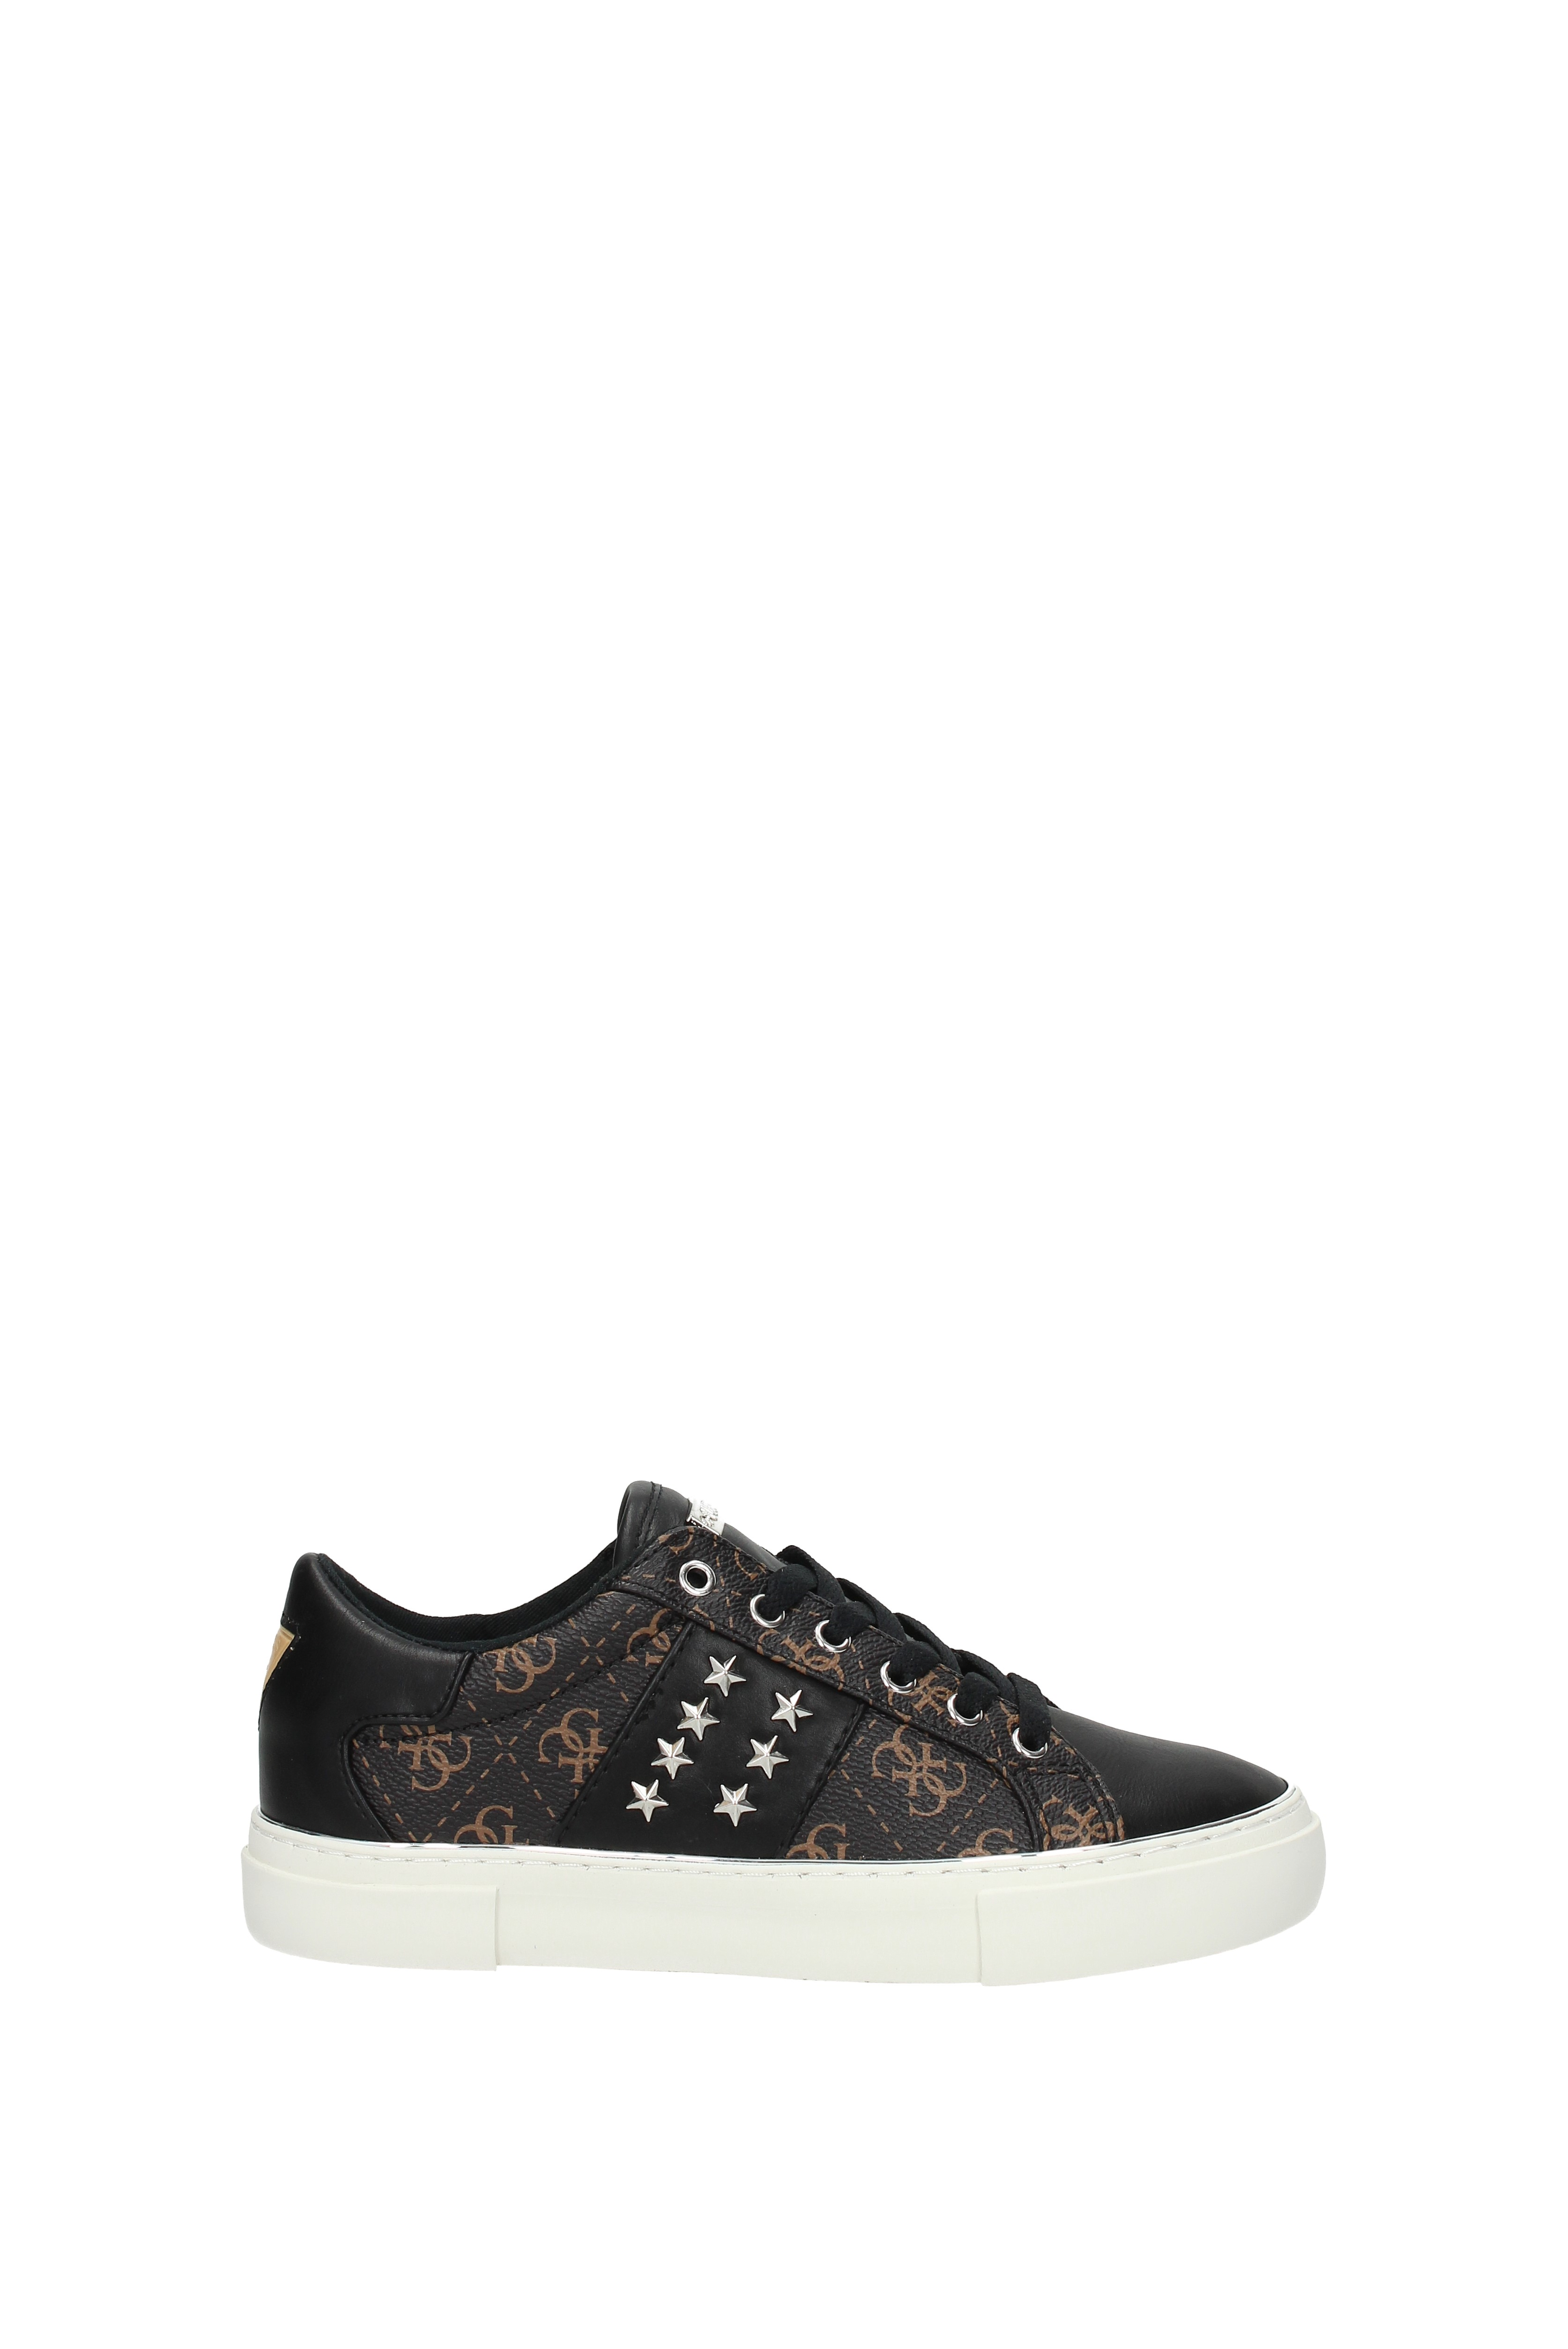 Sneakers Guess Damenschuhe - - Damenschuhe Tessuto (FLGA34FL12) 3aadc4